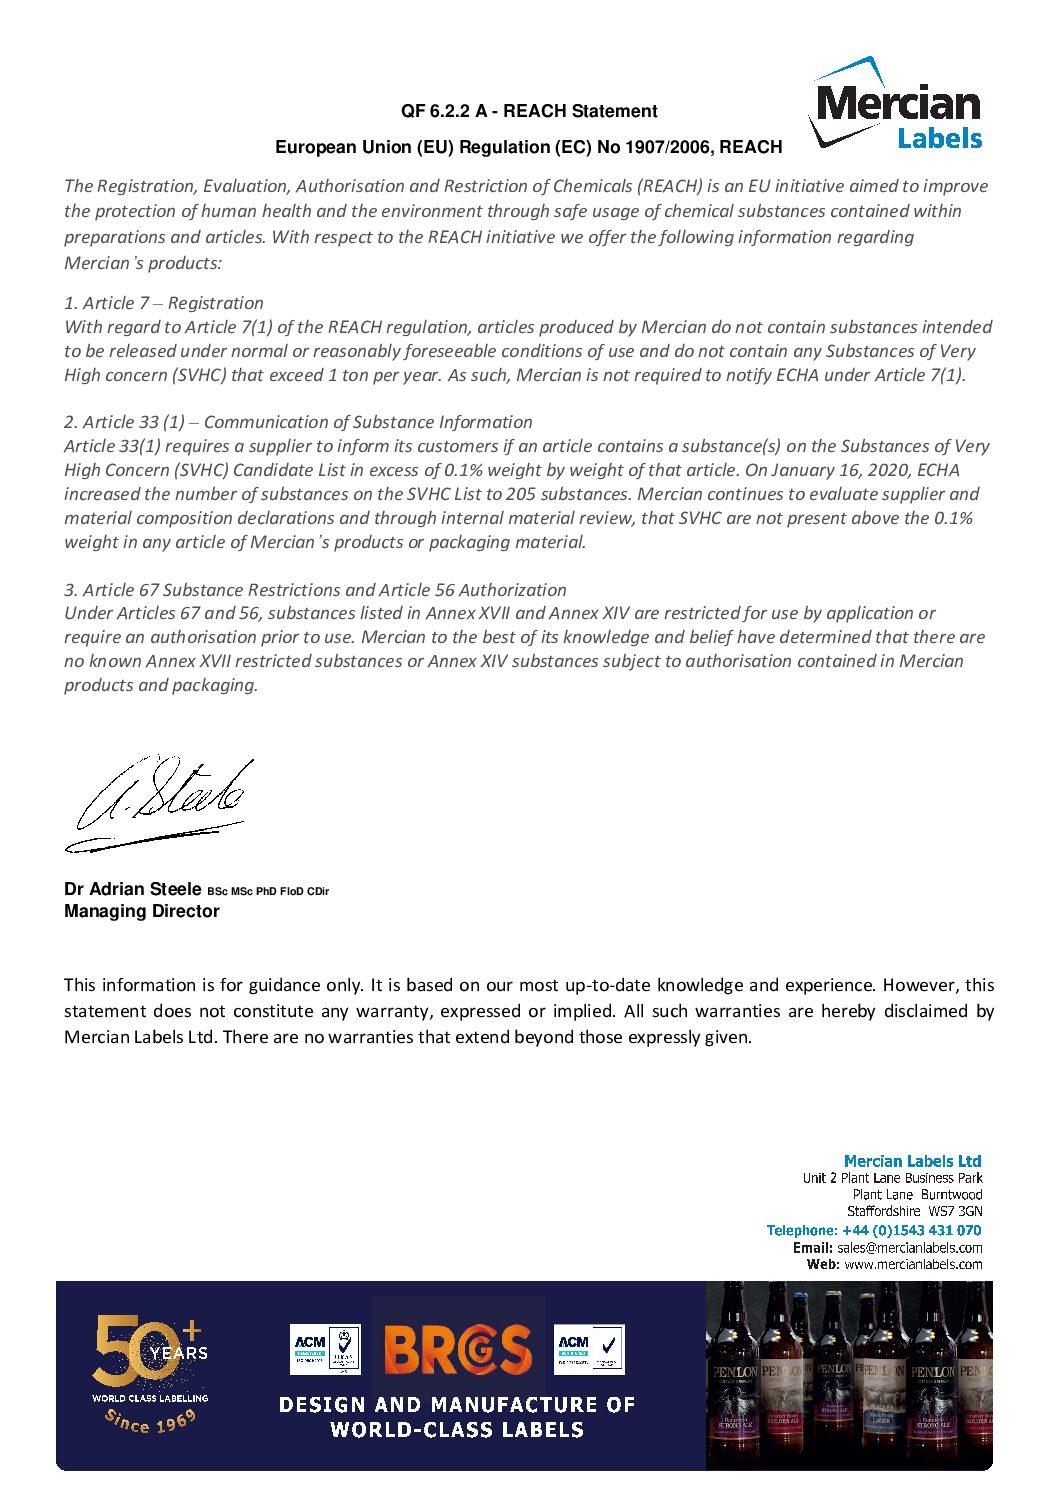 QF 6.2.2 Reach Statement pdf